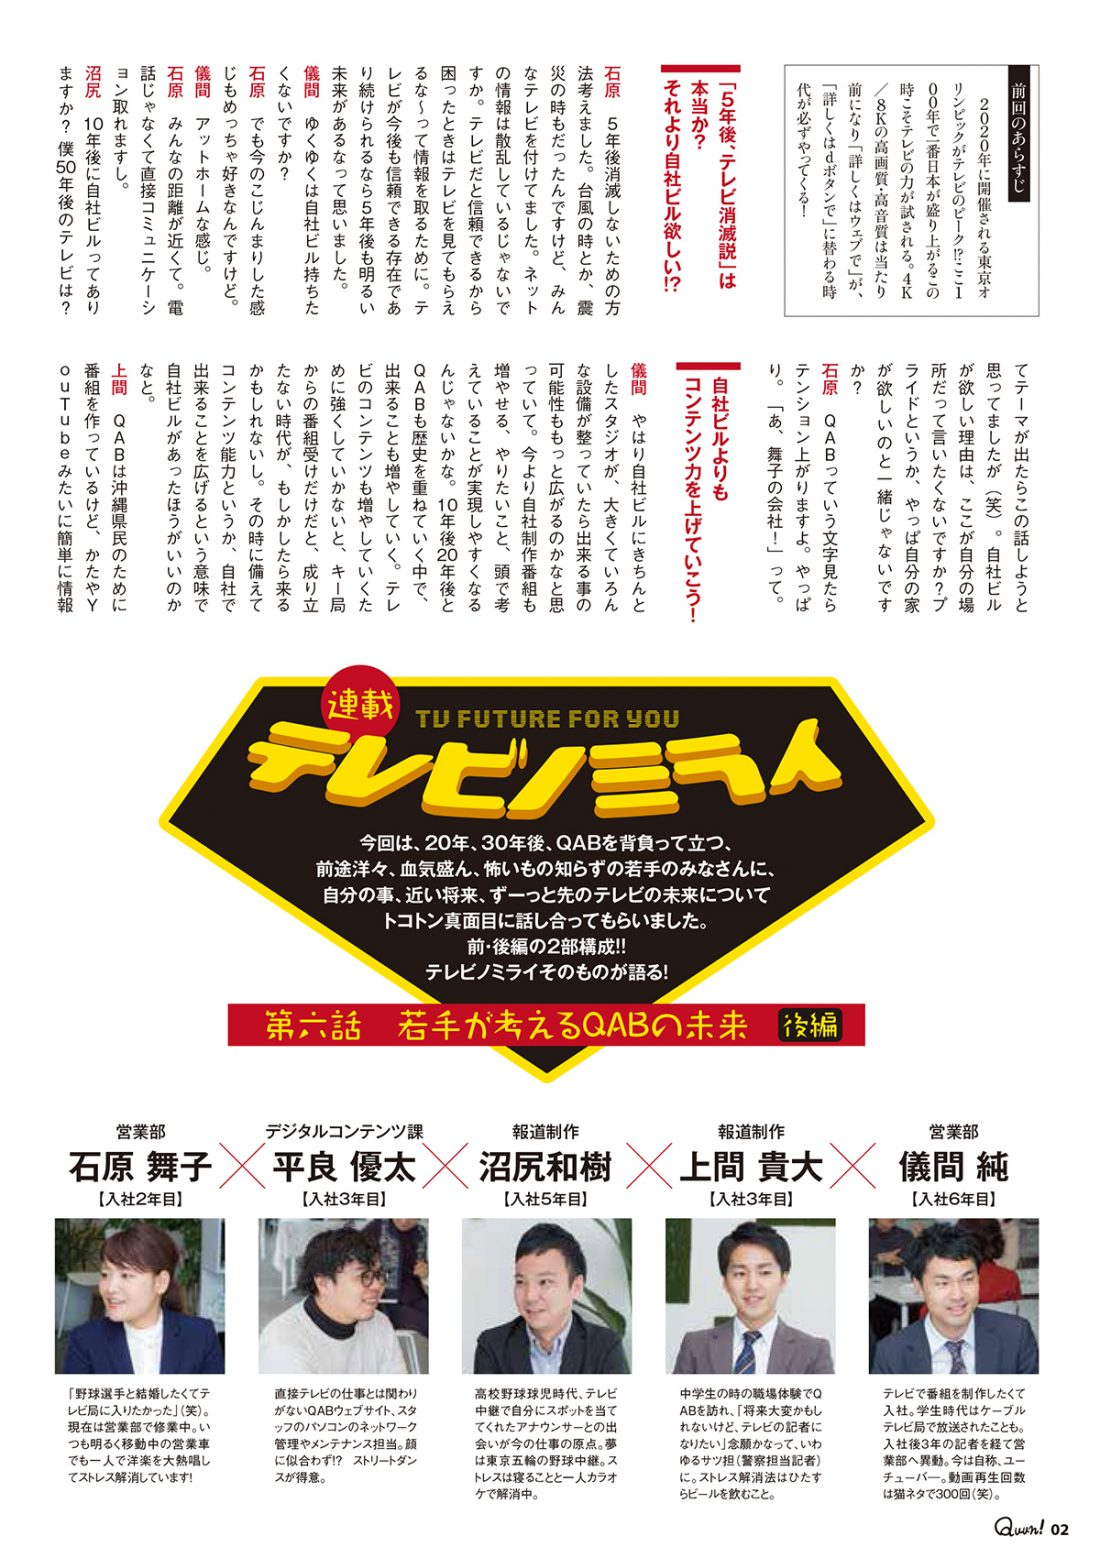 https://www.qab.co.jp/qgoro/wp-content/uploads/quun_0604-1100x1558.jpg